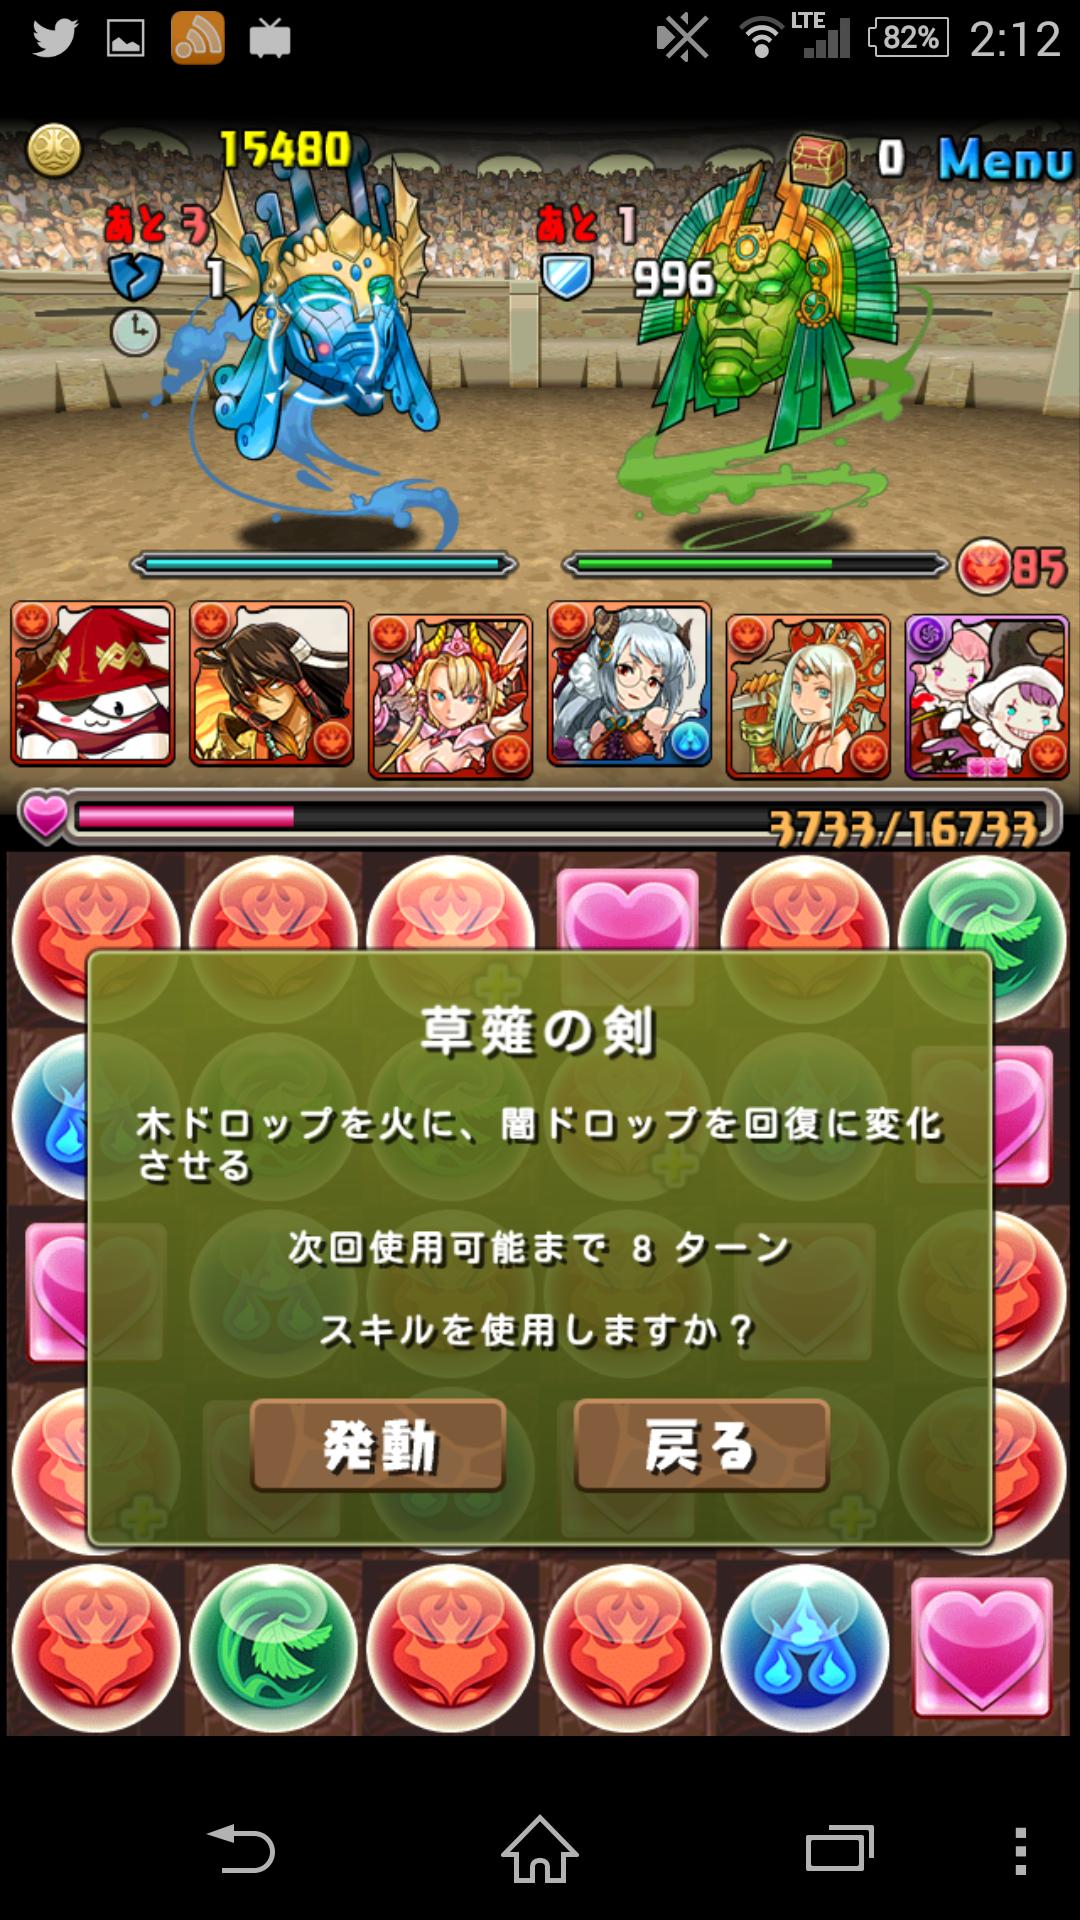 Screenshot_2015-03-12-02-12-02.png